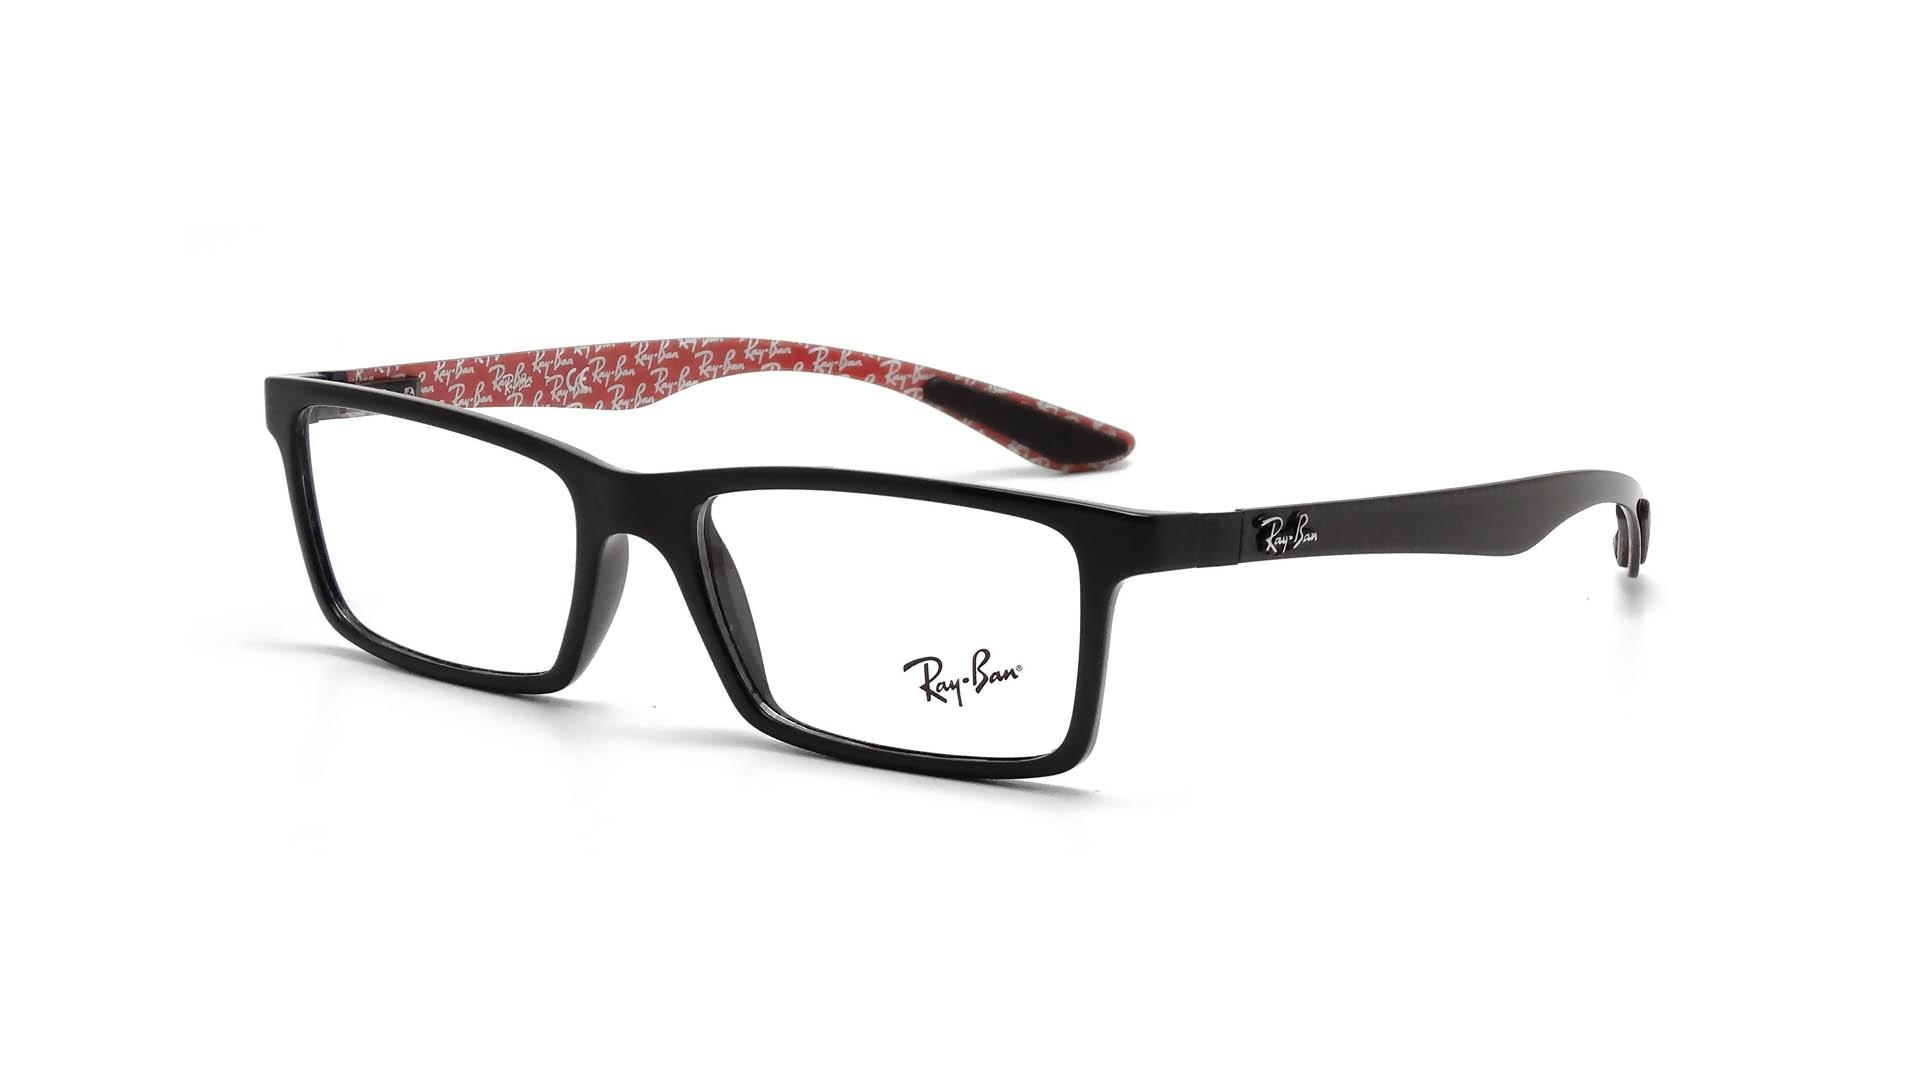 lunettes vue ray ban optical center louisiana bucket brigade. Black Bedroom Furniture Sets. Home Design Ideas